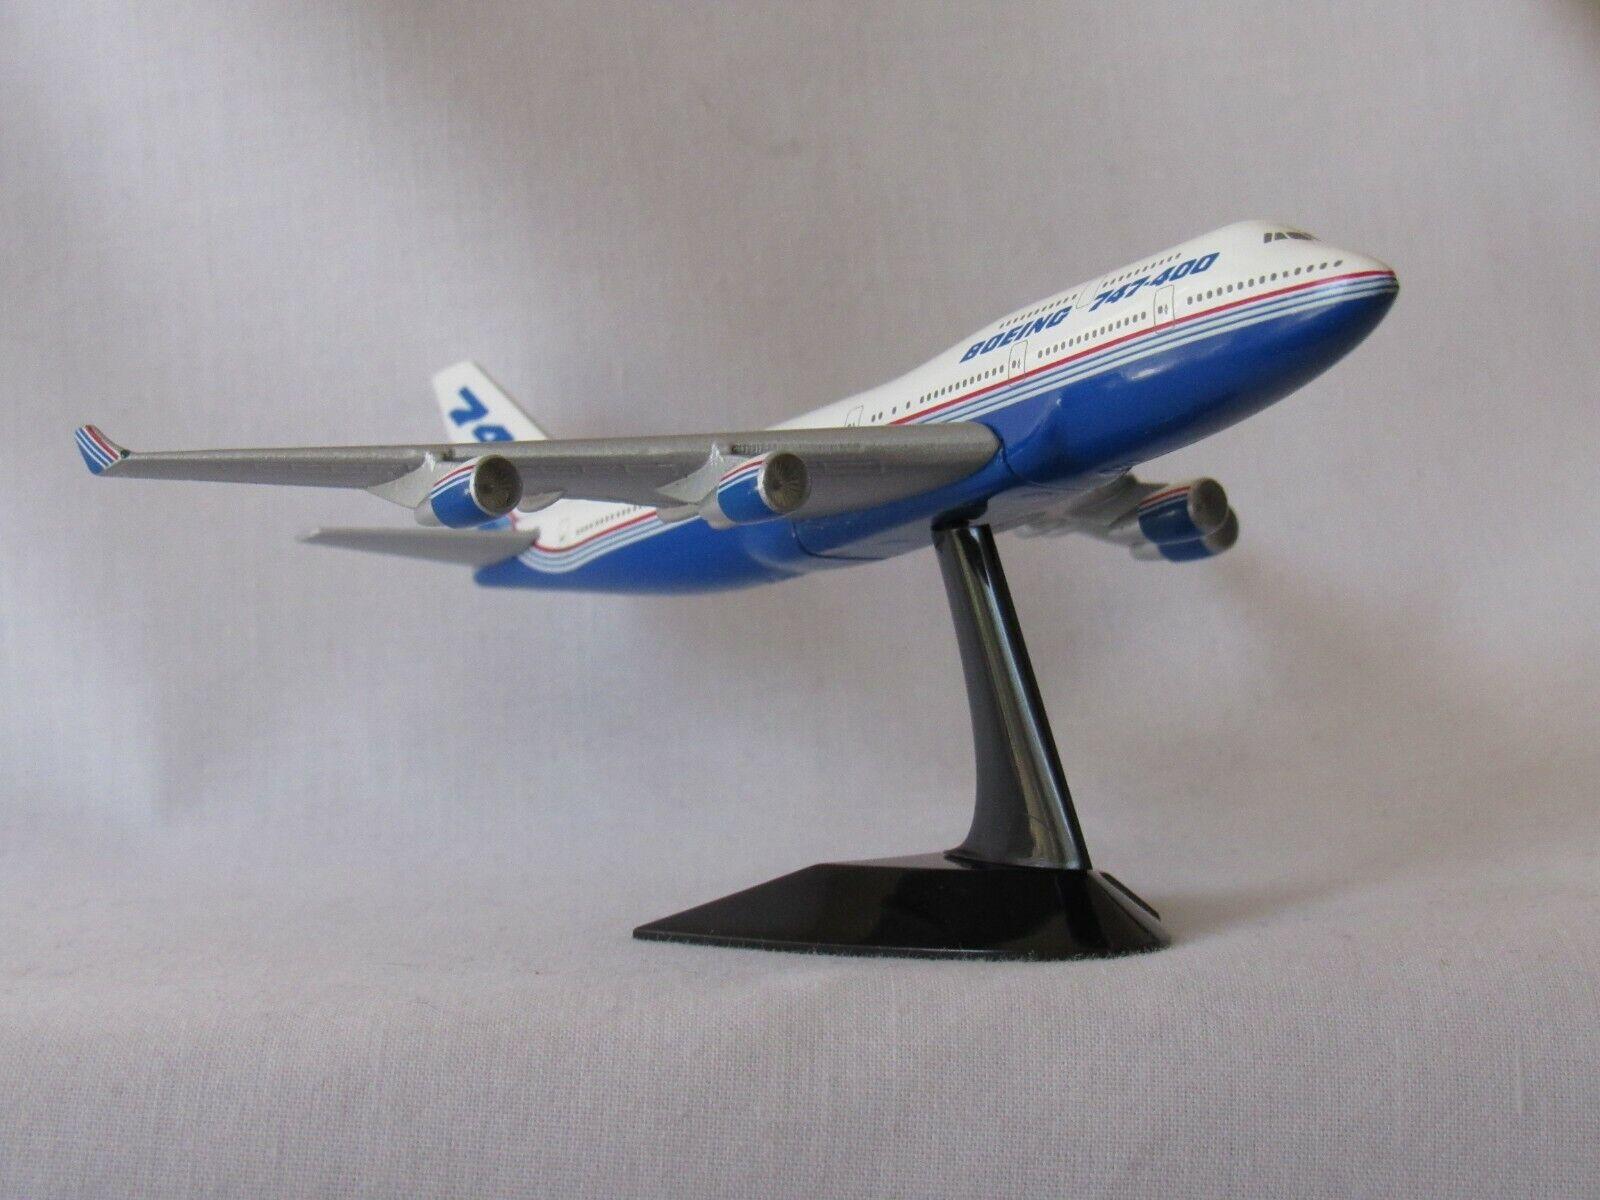 HERPA WINGS BOEING FLEET BOEING 747-400 WITH STAND 500821